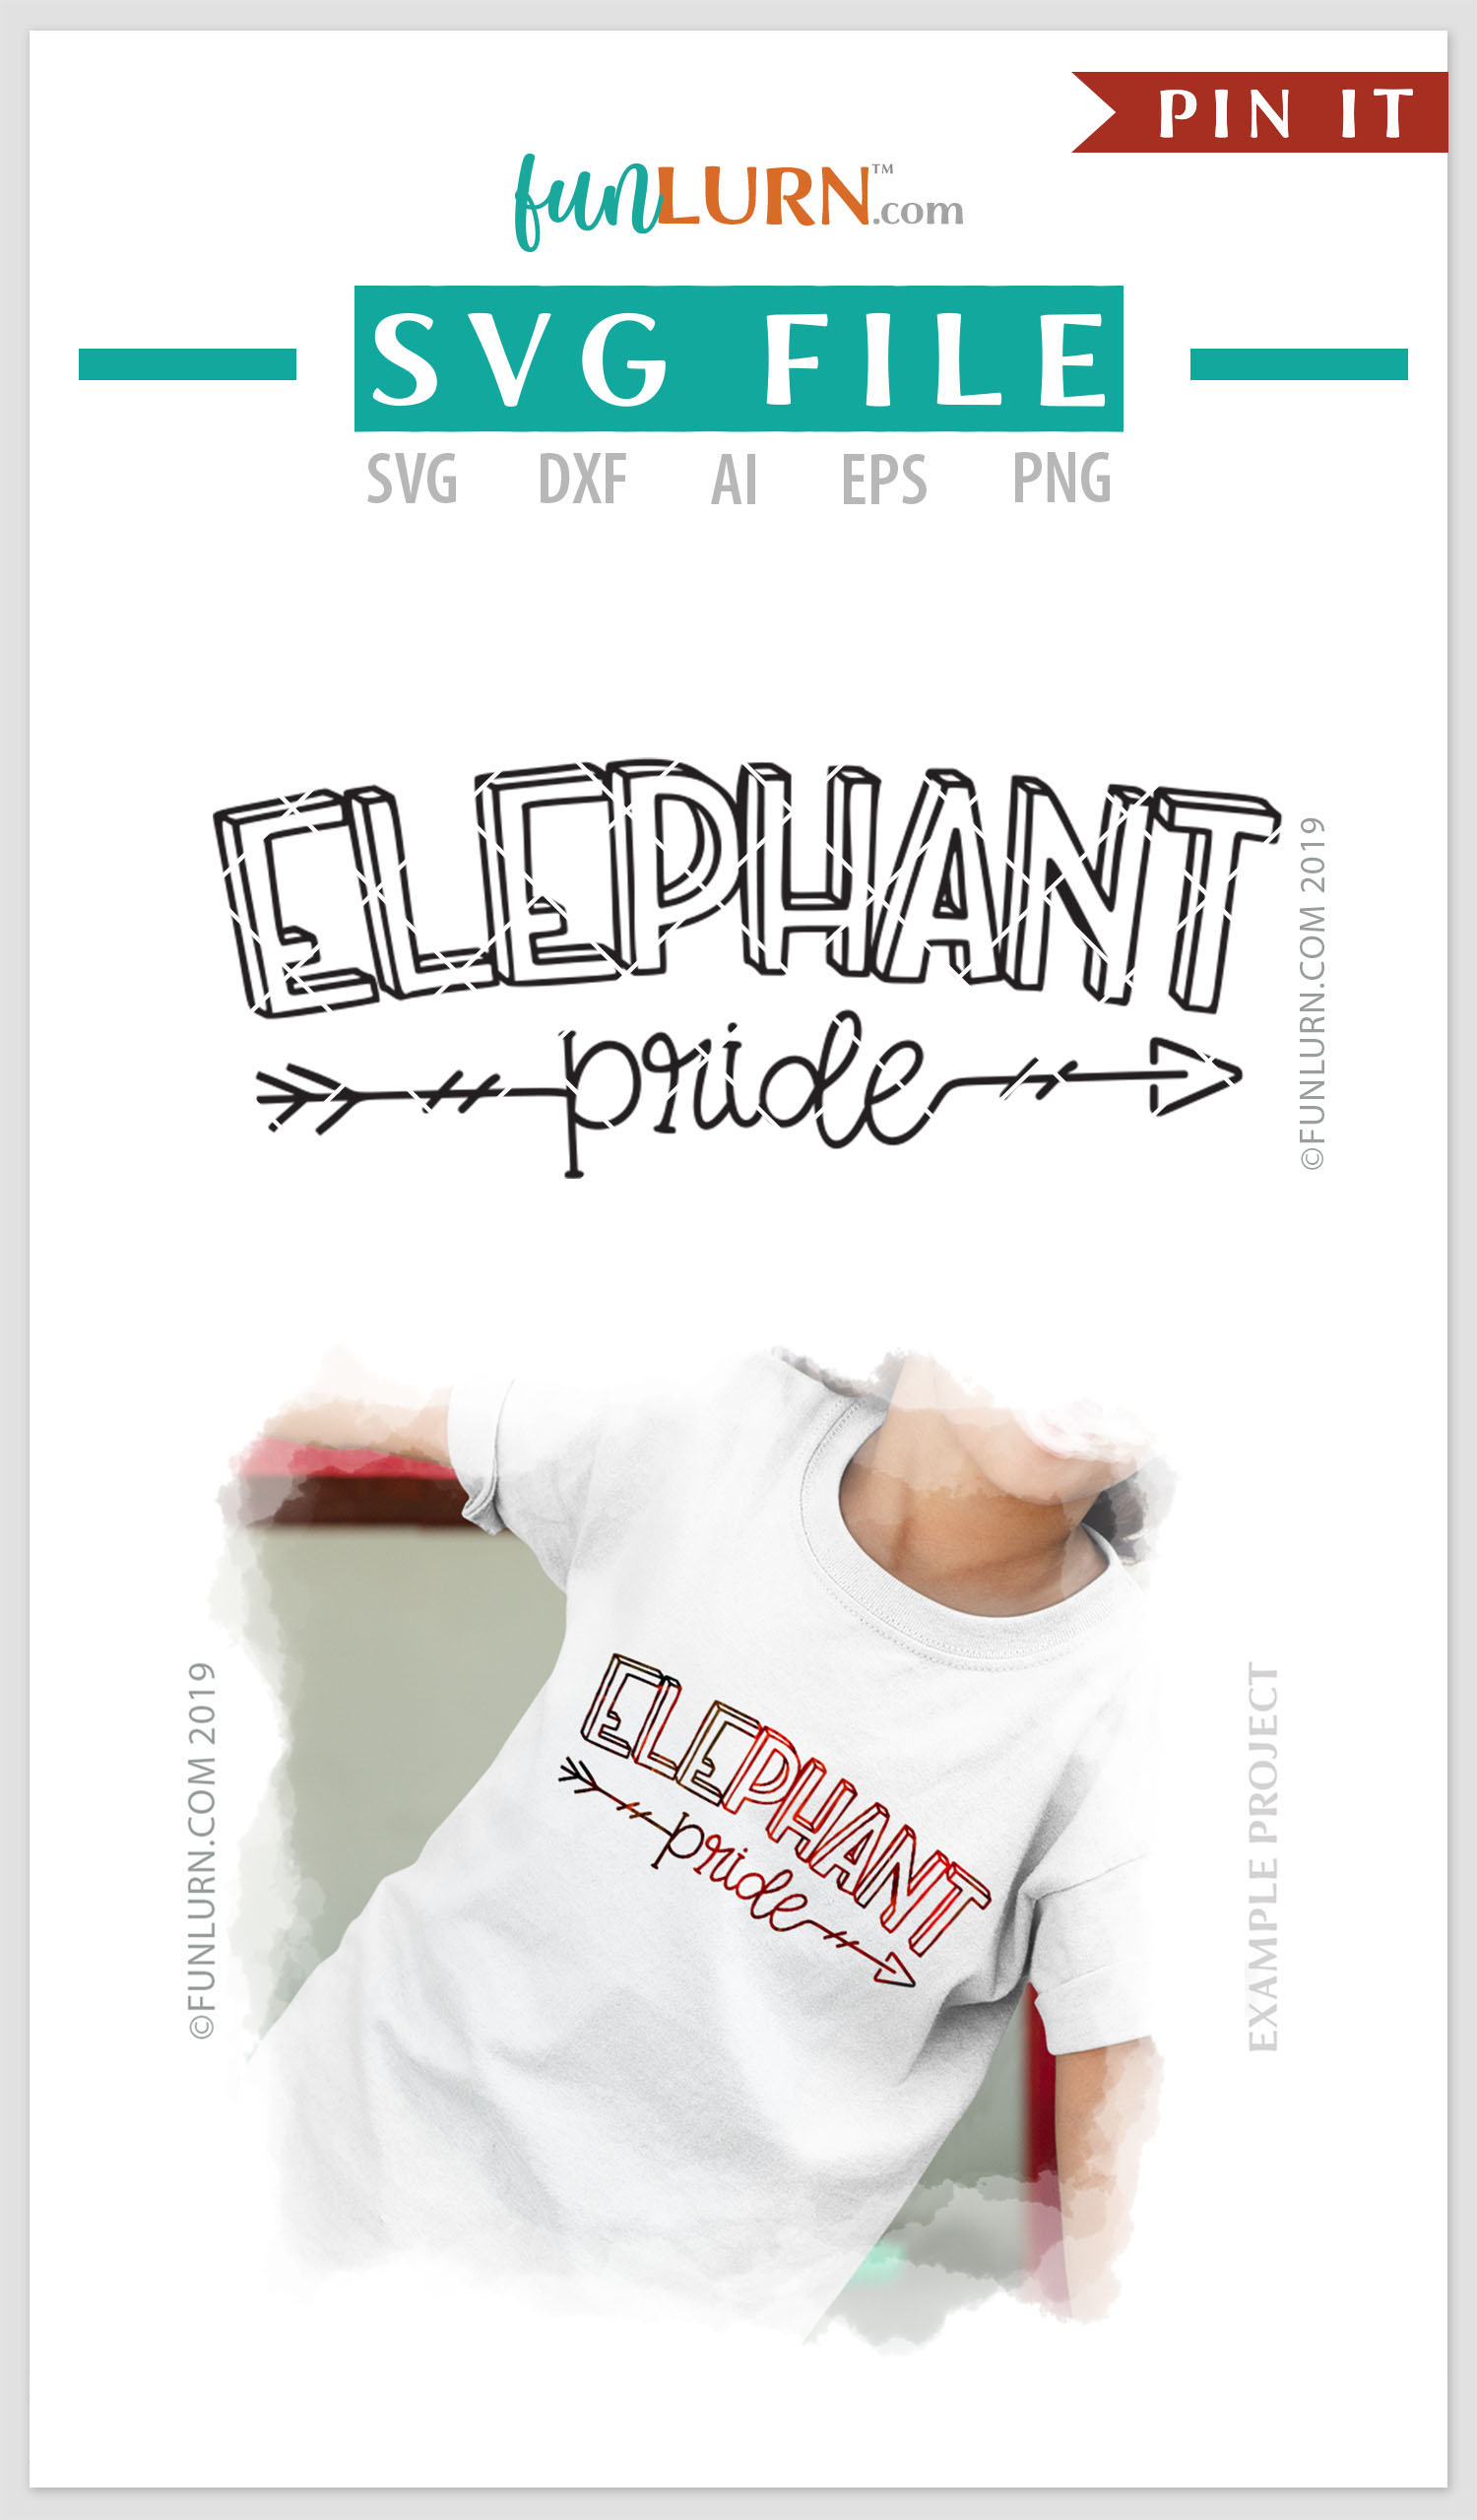 Elephant Pride Team SVG Cut File example image 4